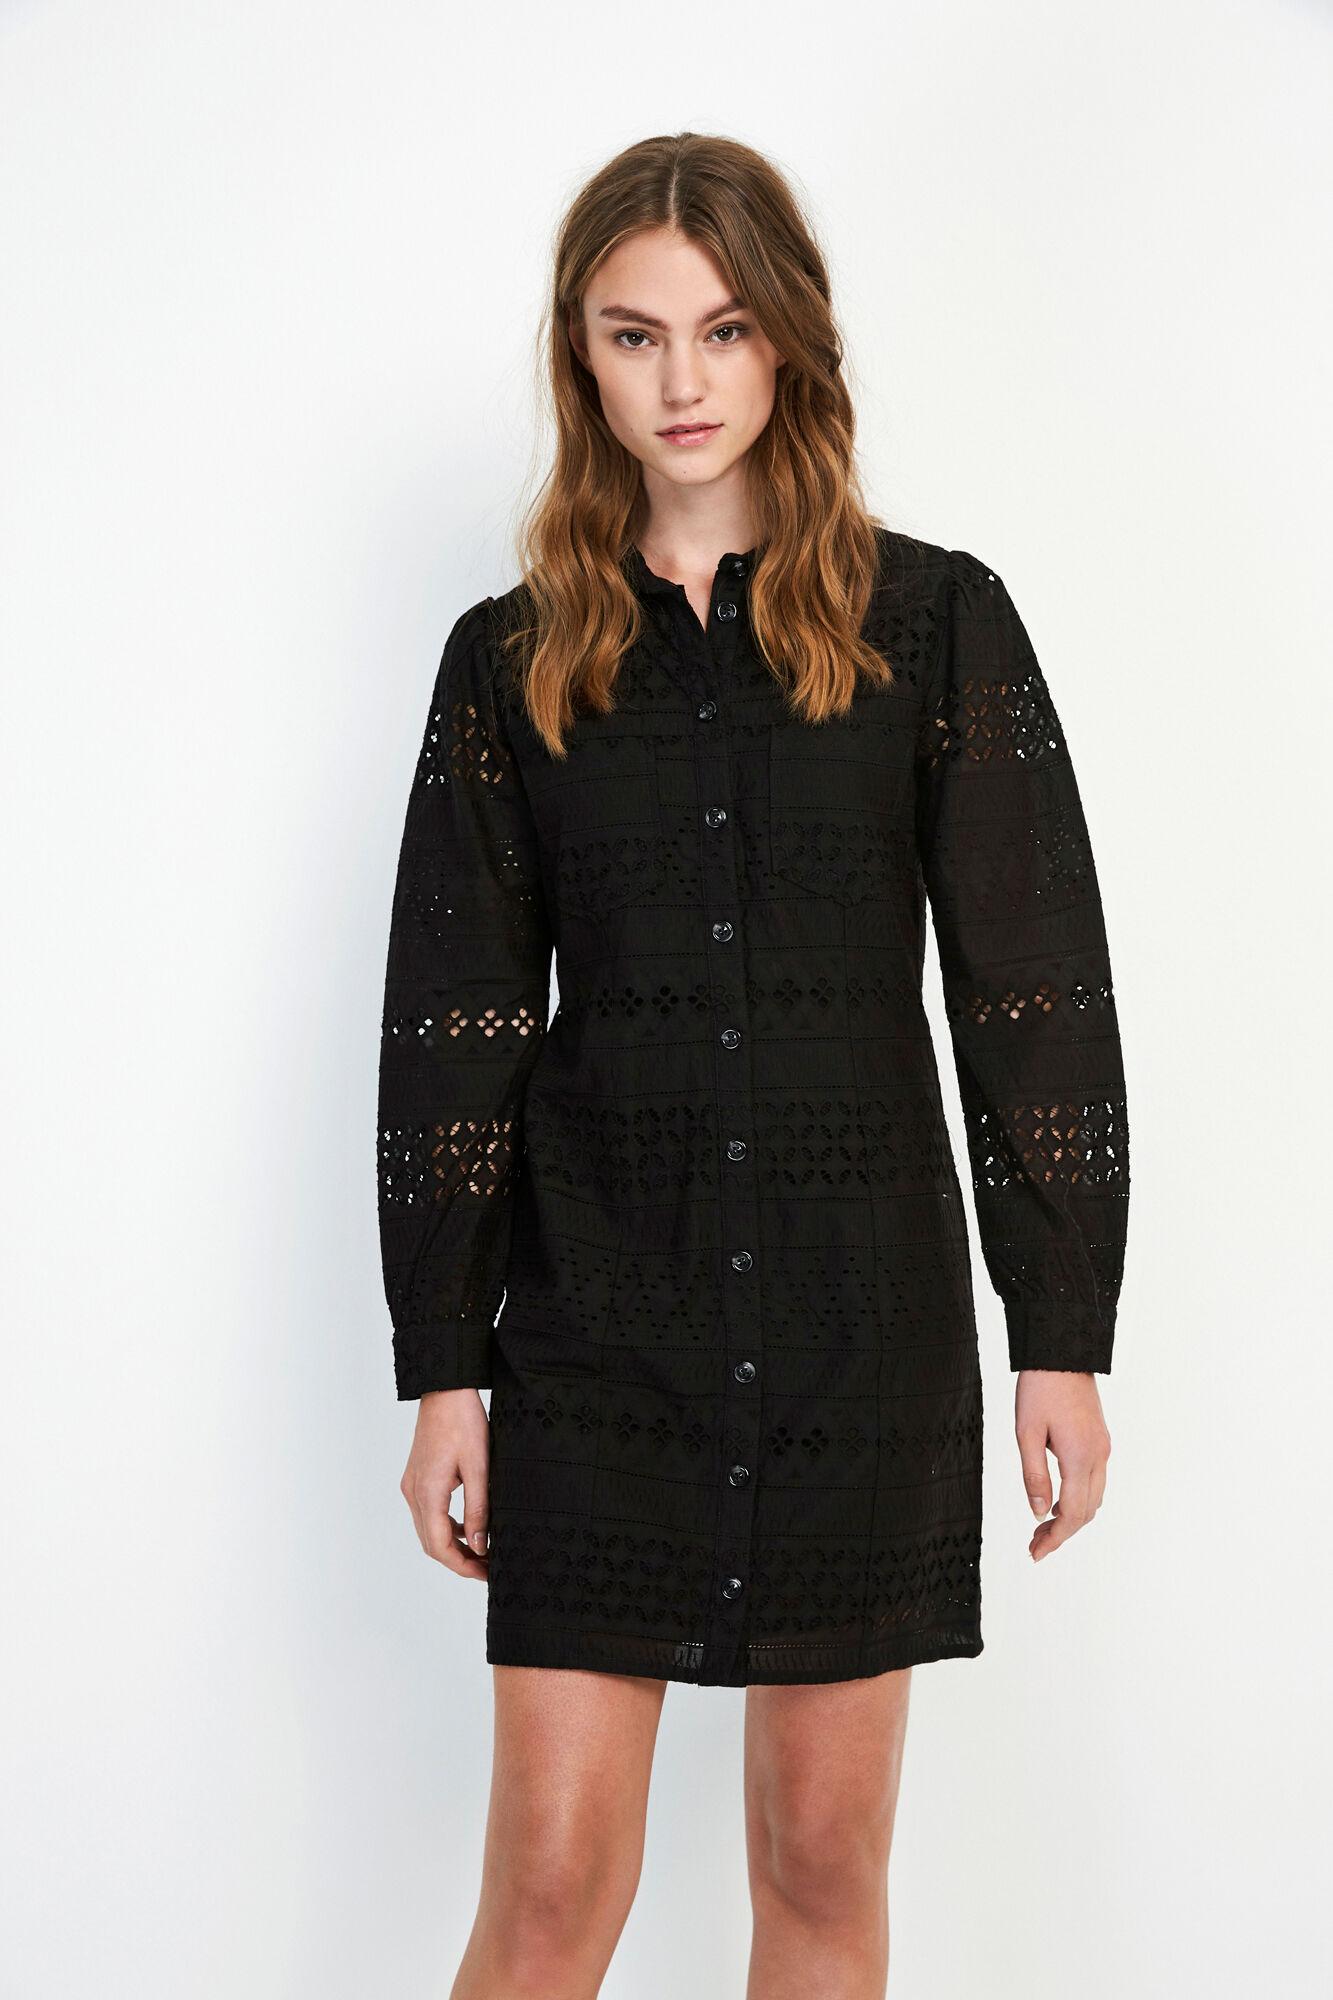 ENCHRIS LS DRESS 6695